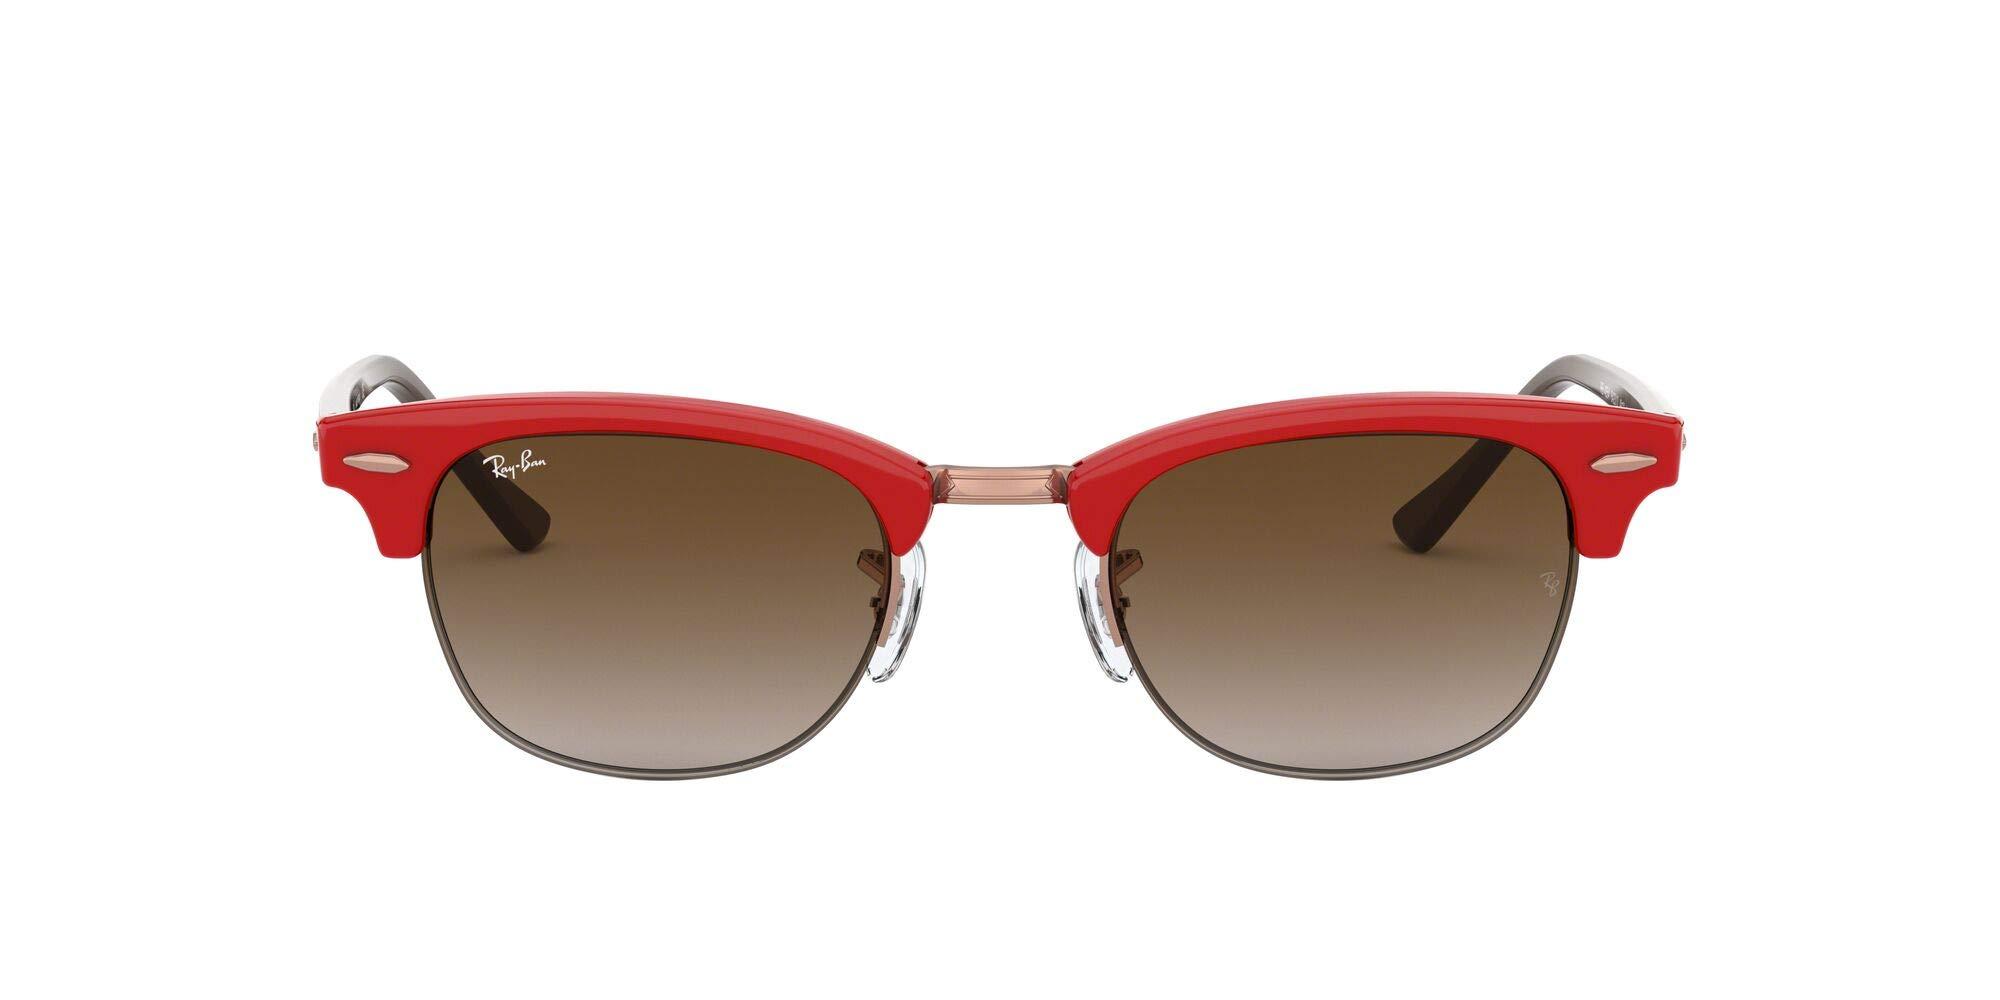 Ray-Ban RB4354 Round Sunglasses